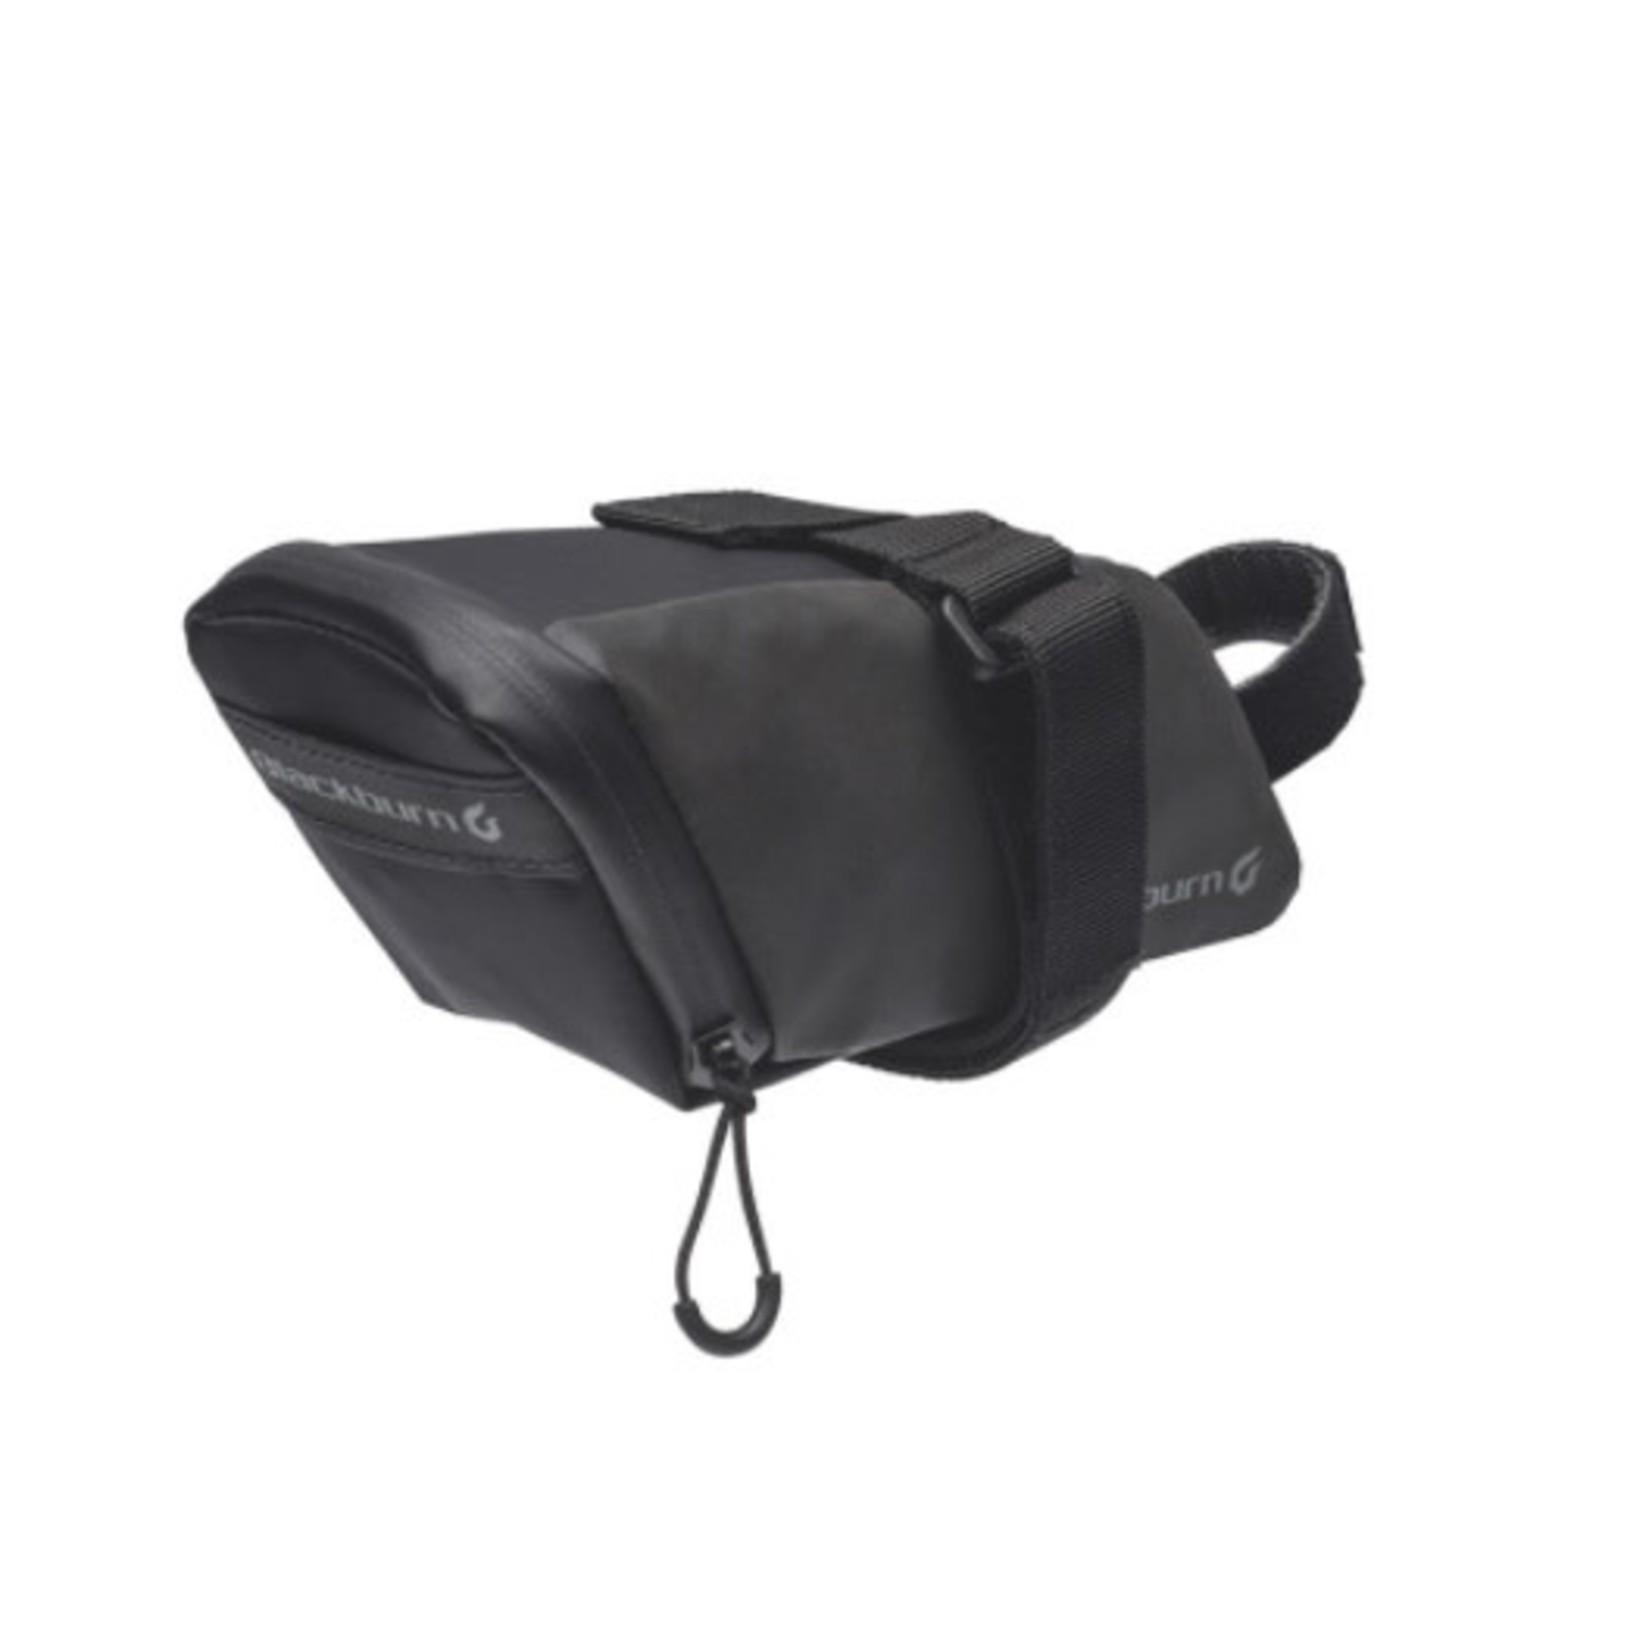 Blackburn Seat Bag Grid Reflective Medium